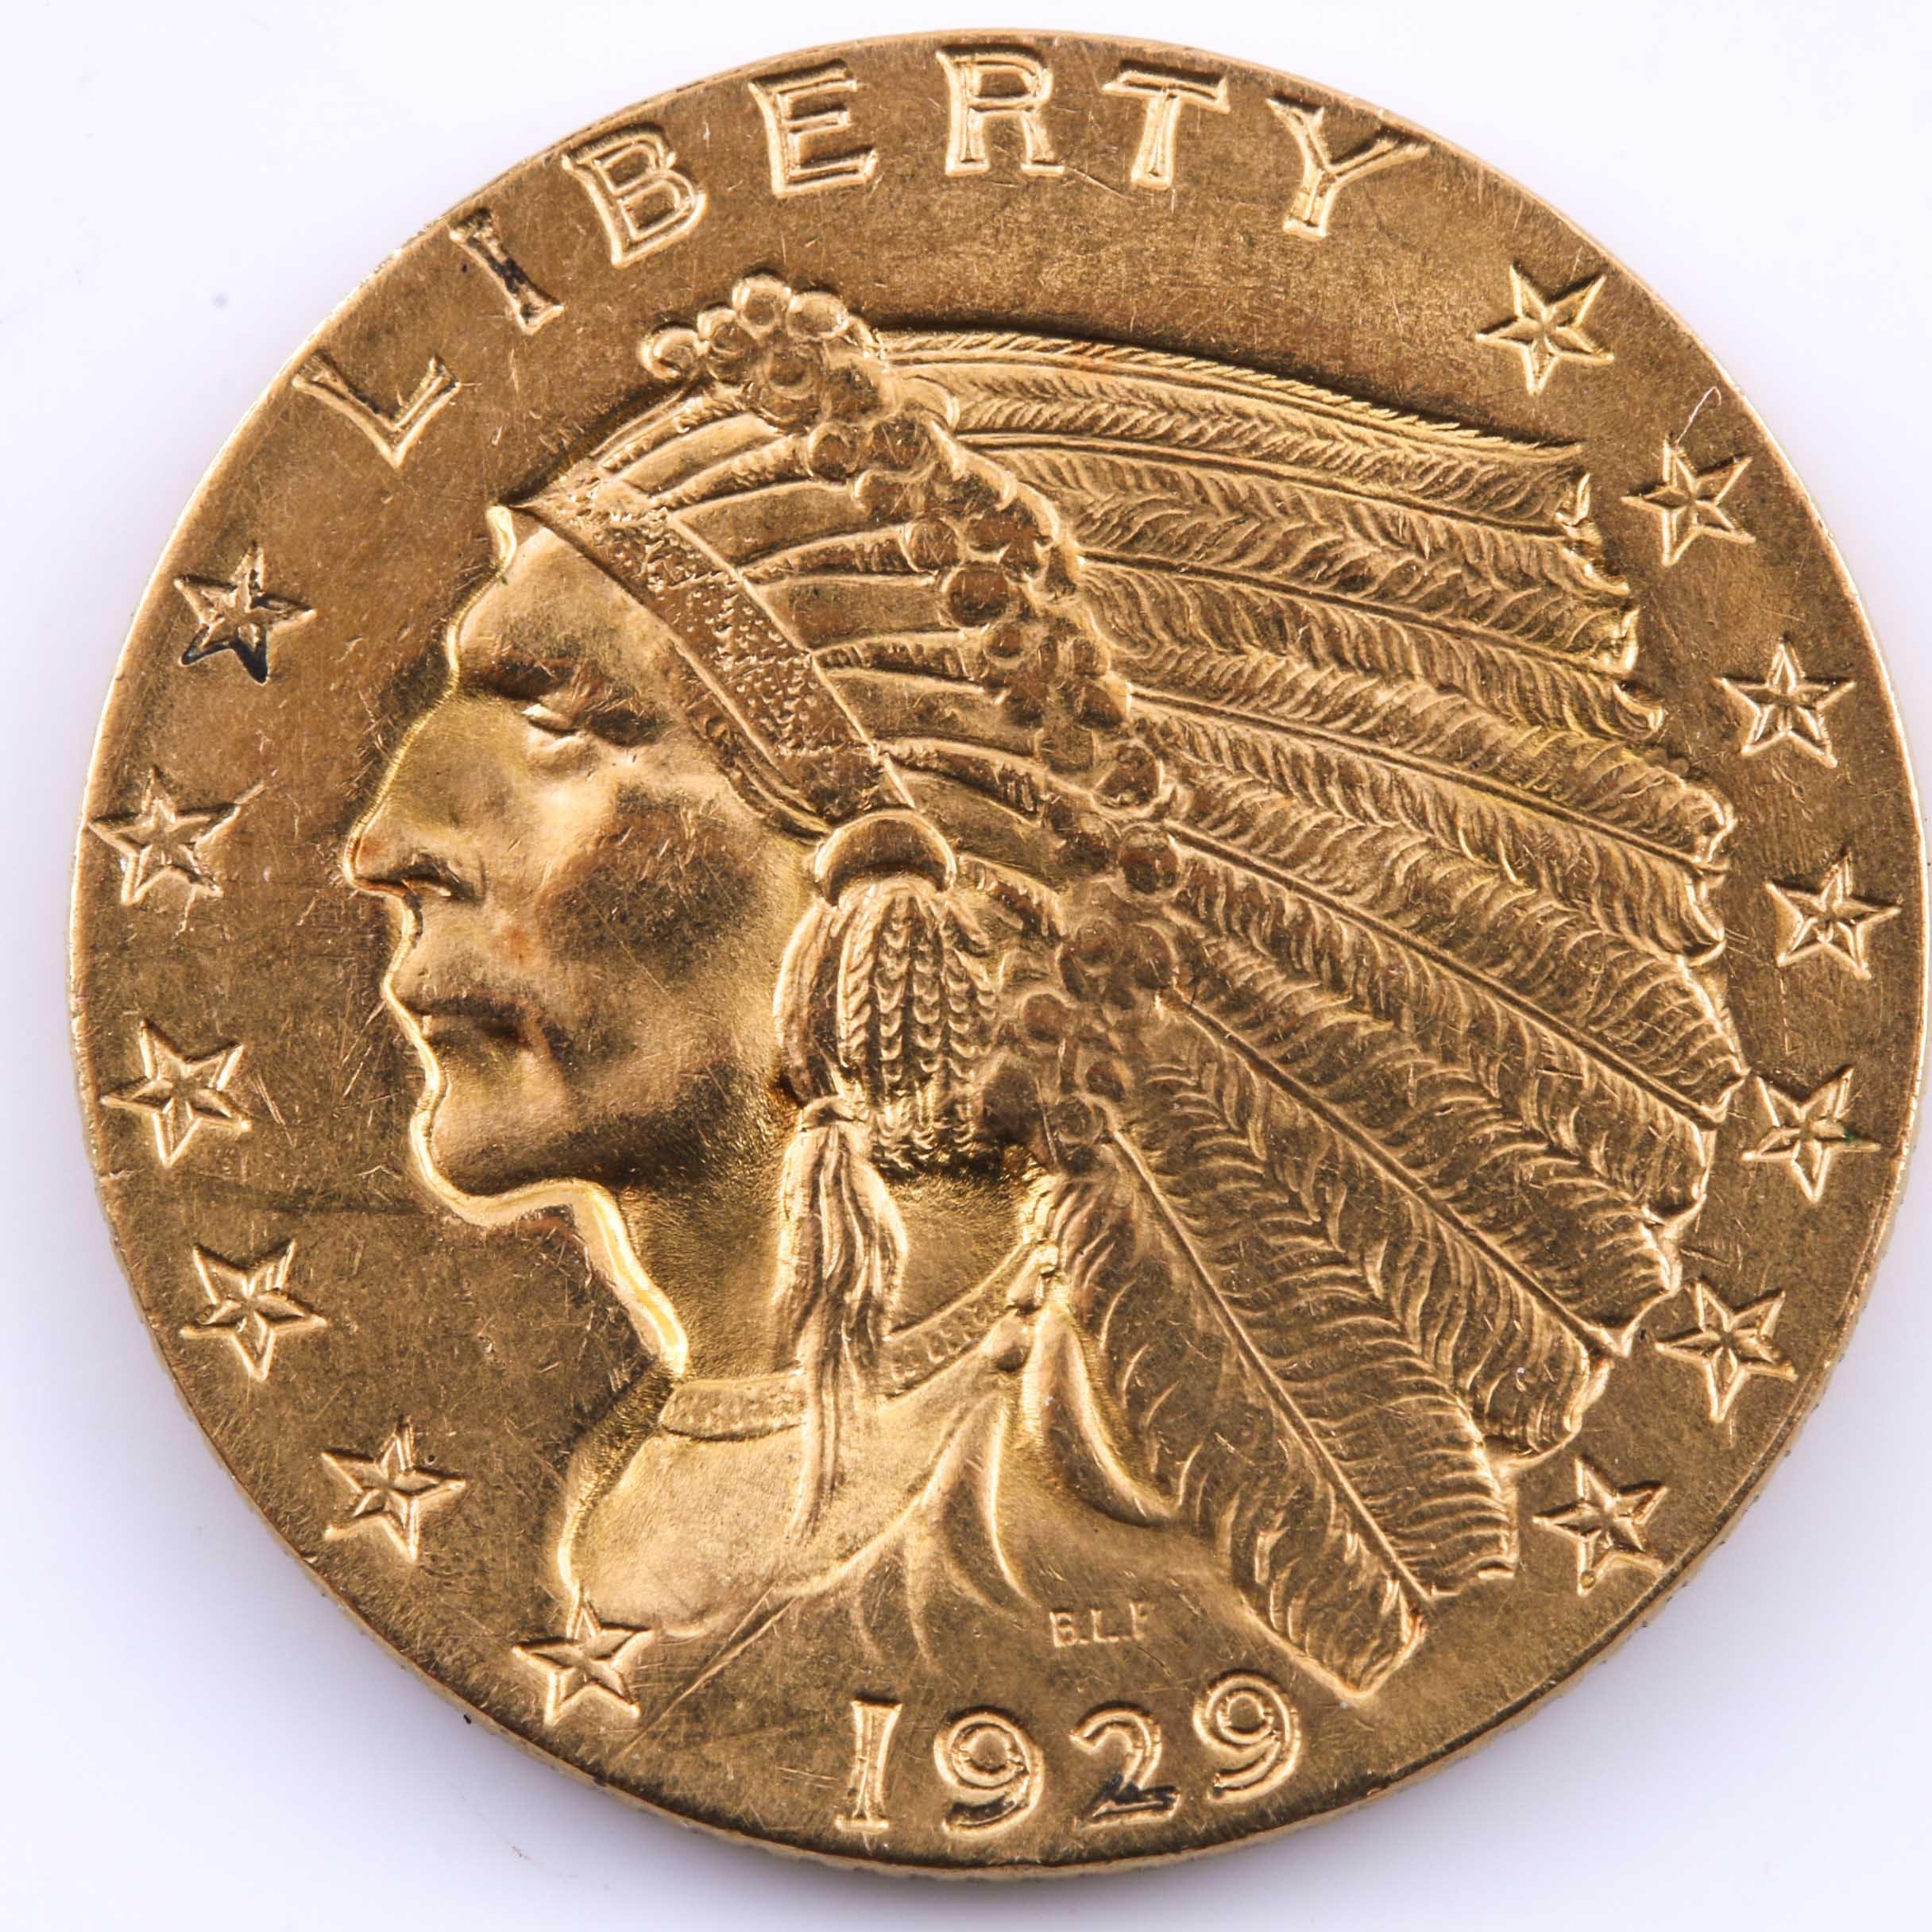 1925 D $2 1/2 Indian Head Gold Coin